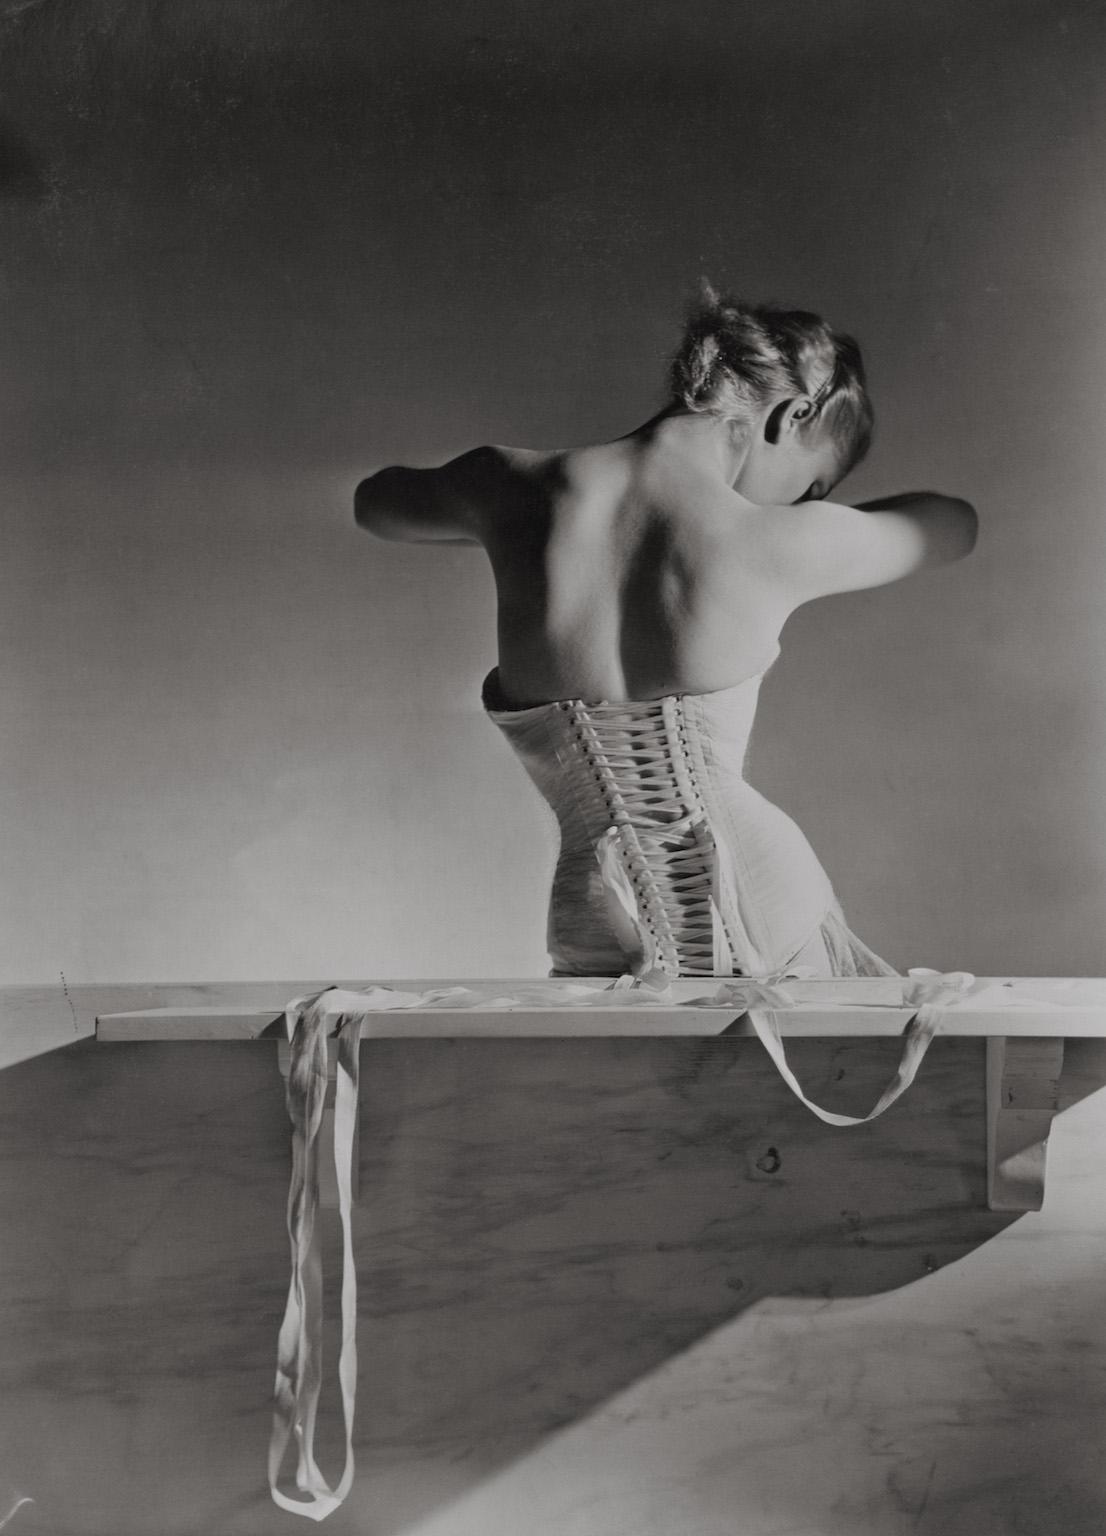 Corset by Detolle for Mainbocher, 1939. © Condé Nast / Horst Estate.